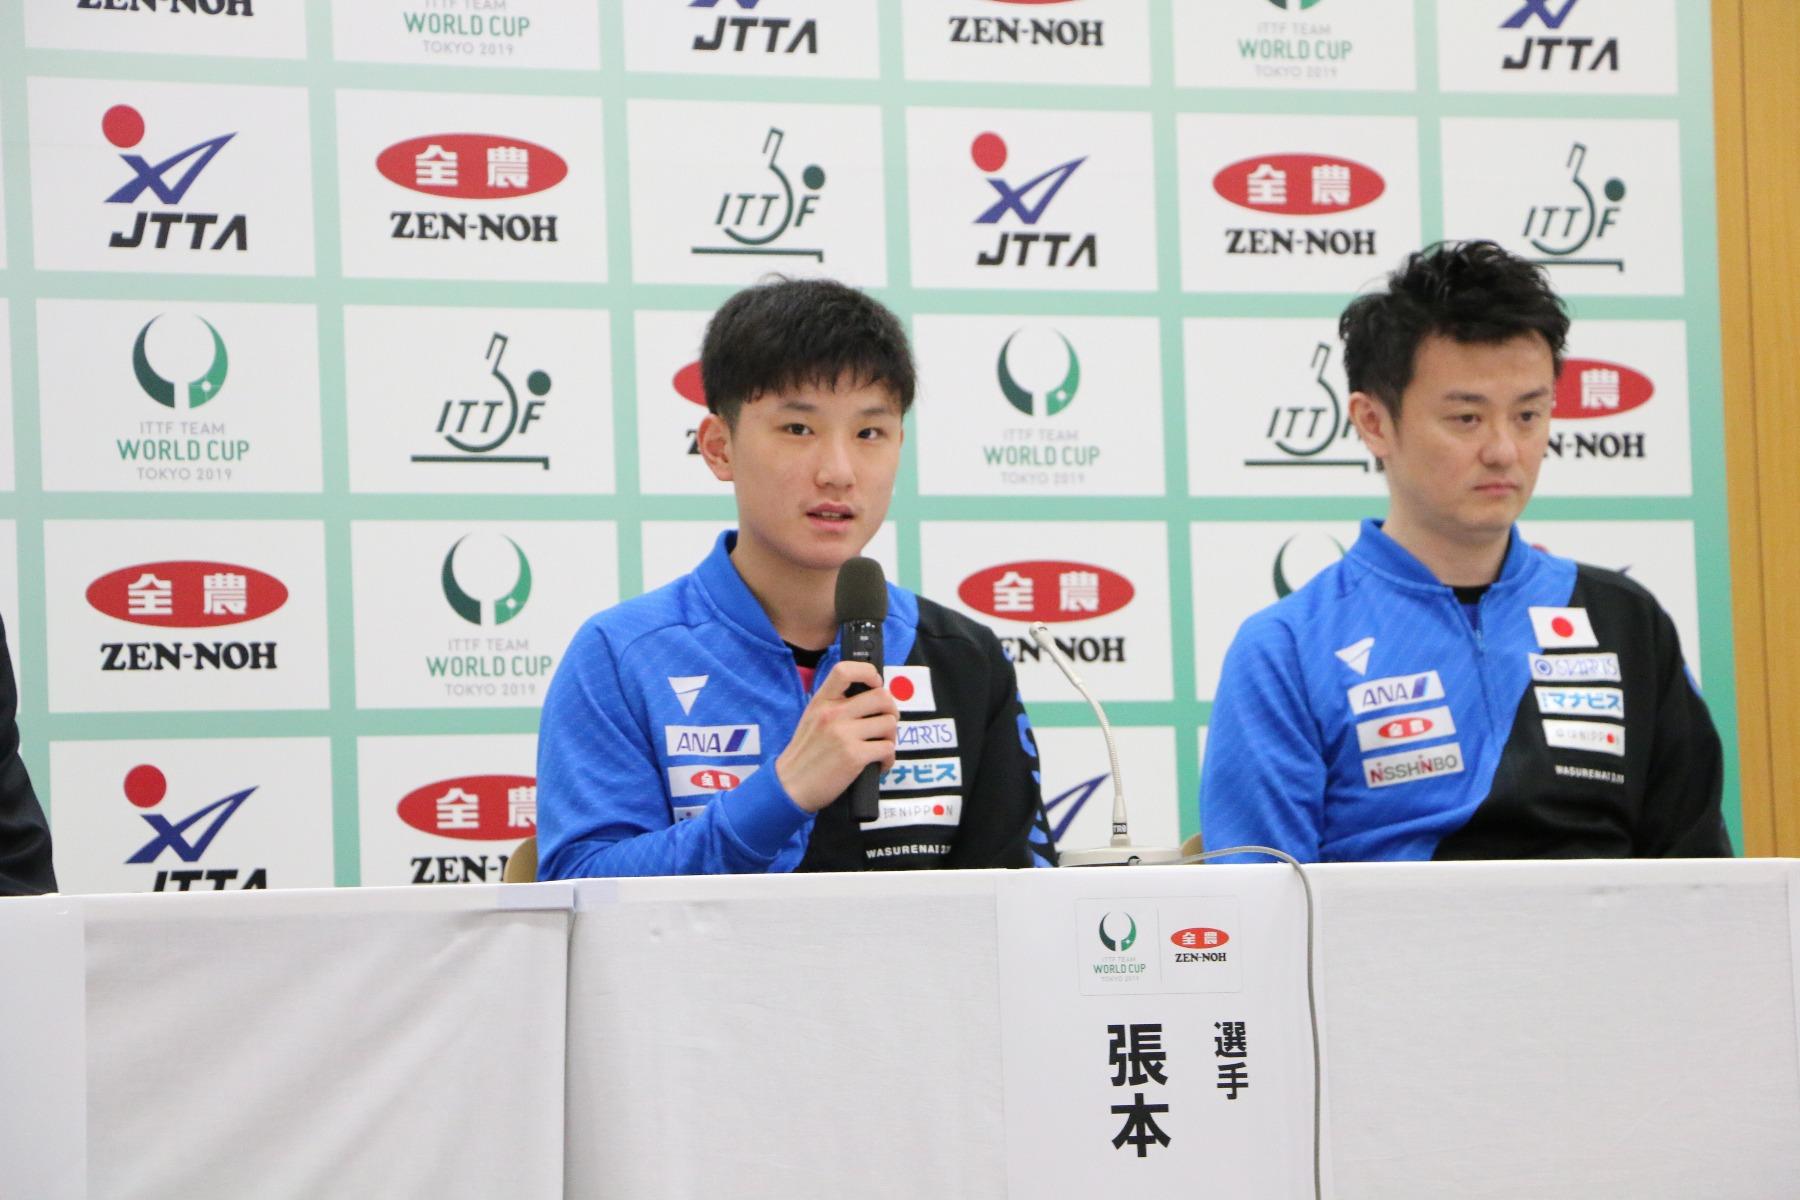 JA全農 チームワールドカップ 東京大会 開催記者発表 会見 張本智和